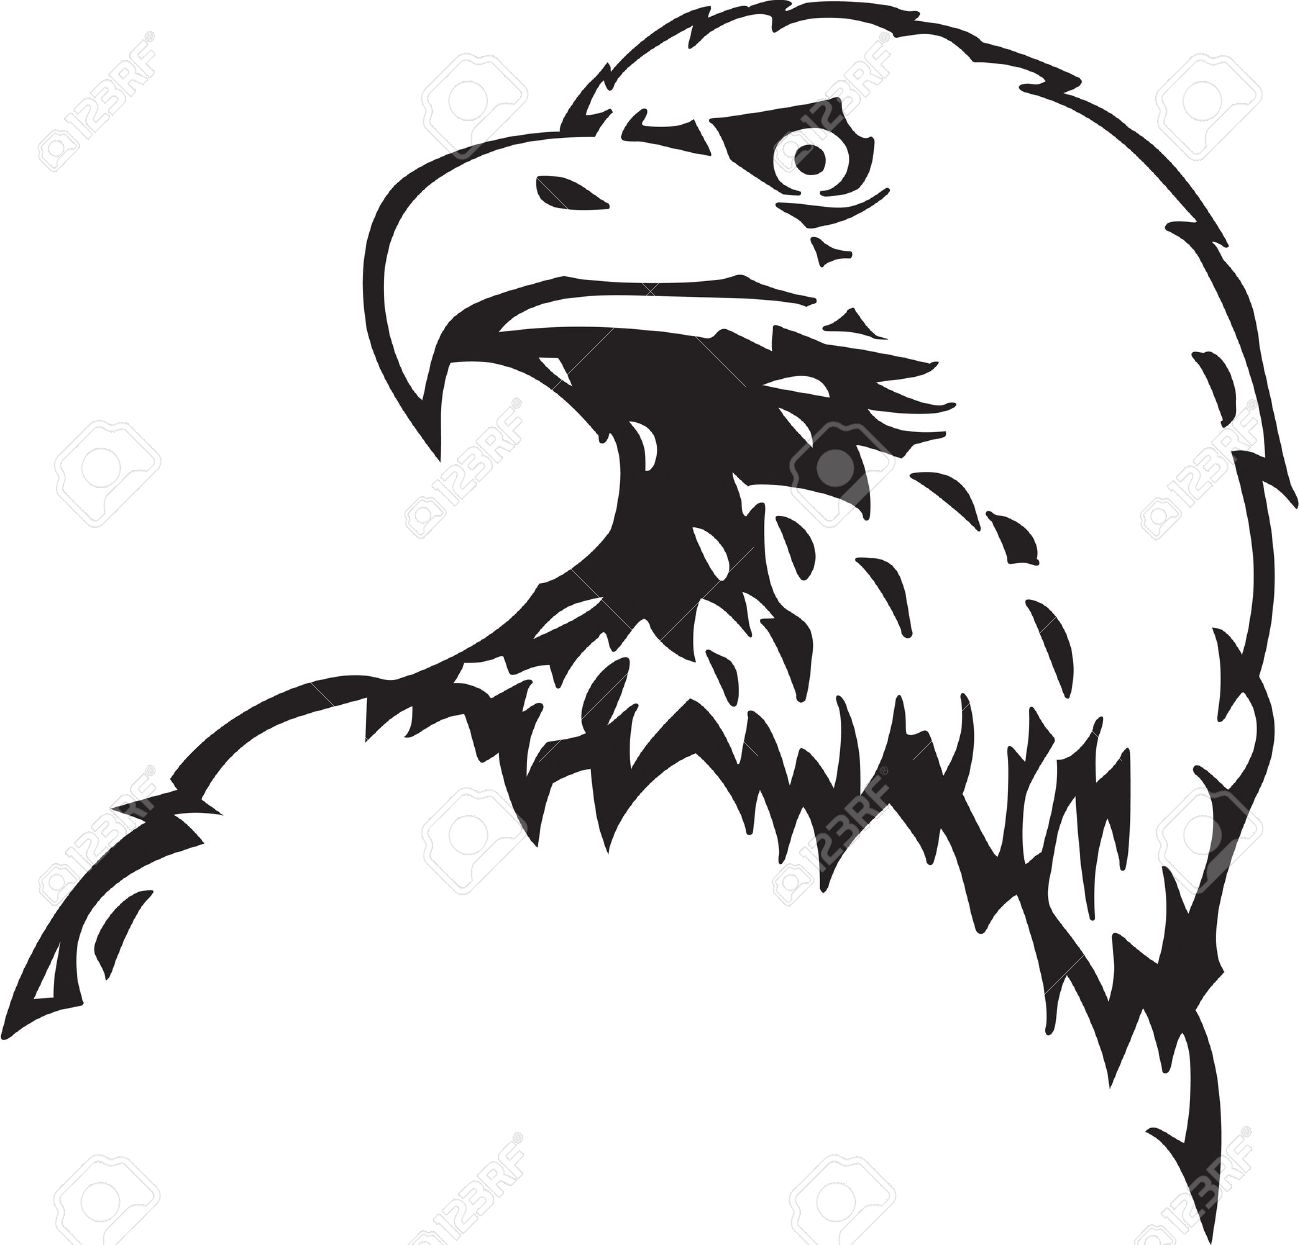 Eagle Clipart Vector 20 Free Cliparts